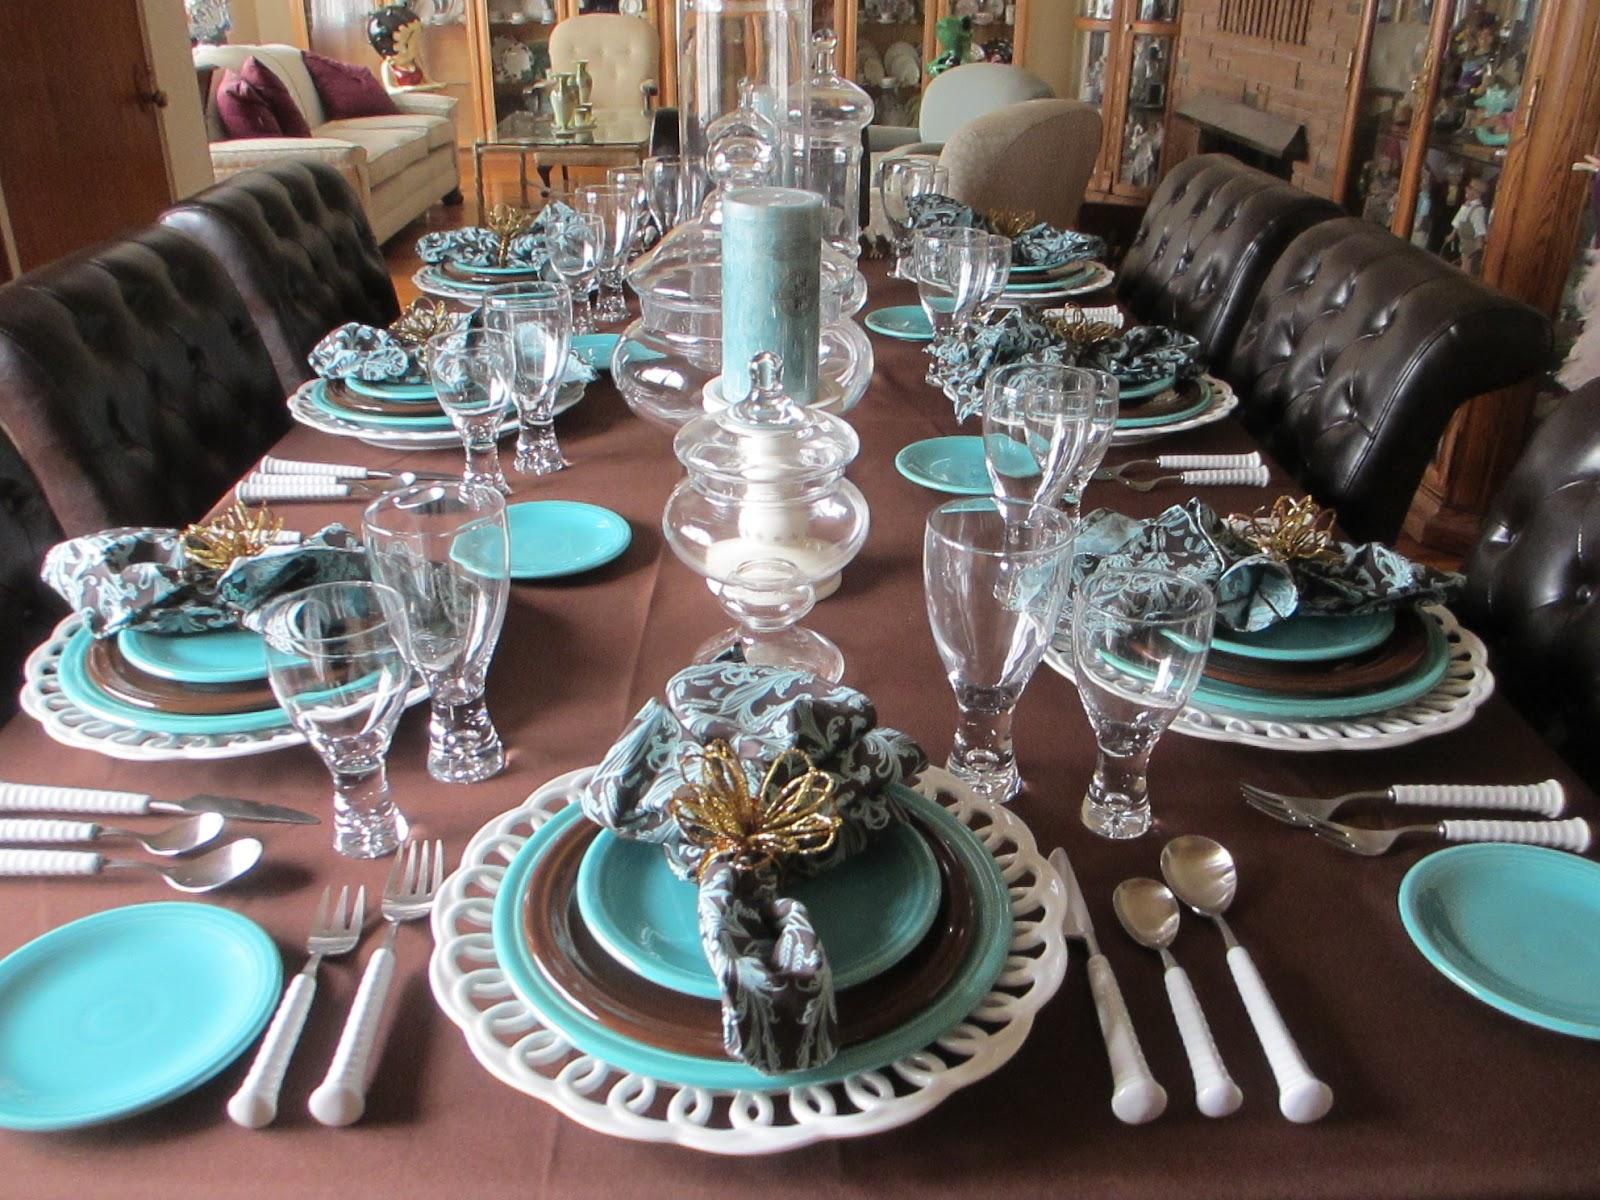 Fiestaware Table Settings